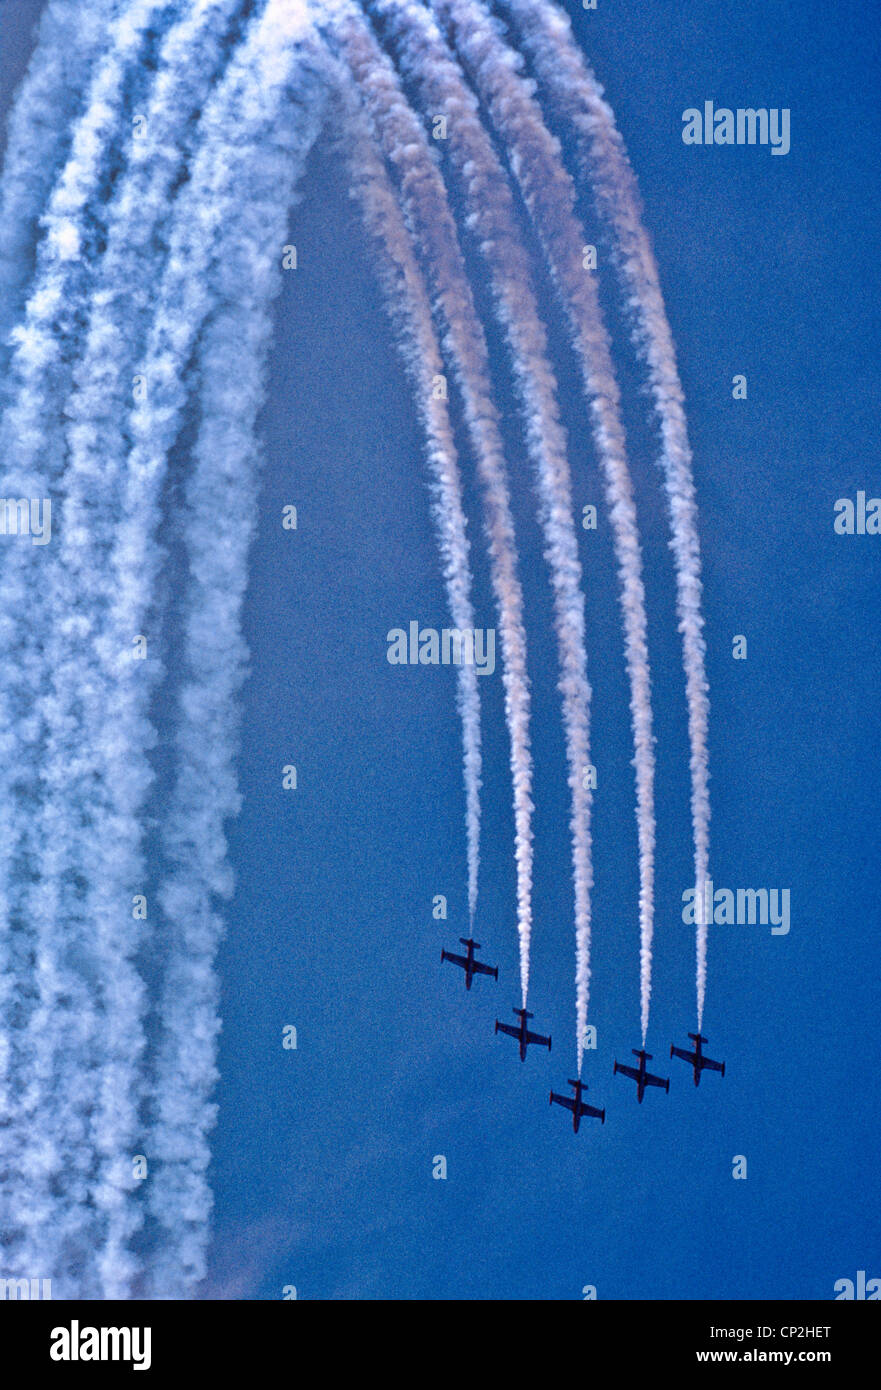 Royal Australian Air Force RAAF Aerobatic Team, Victoria Australia - Stock Image